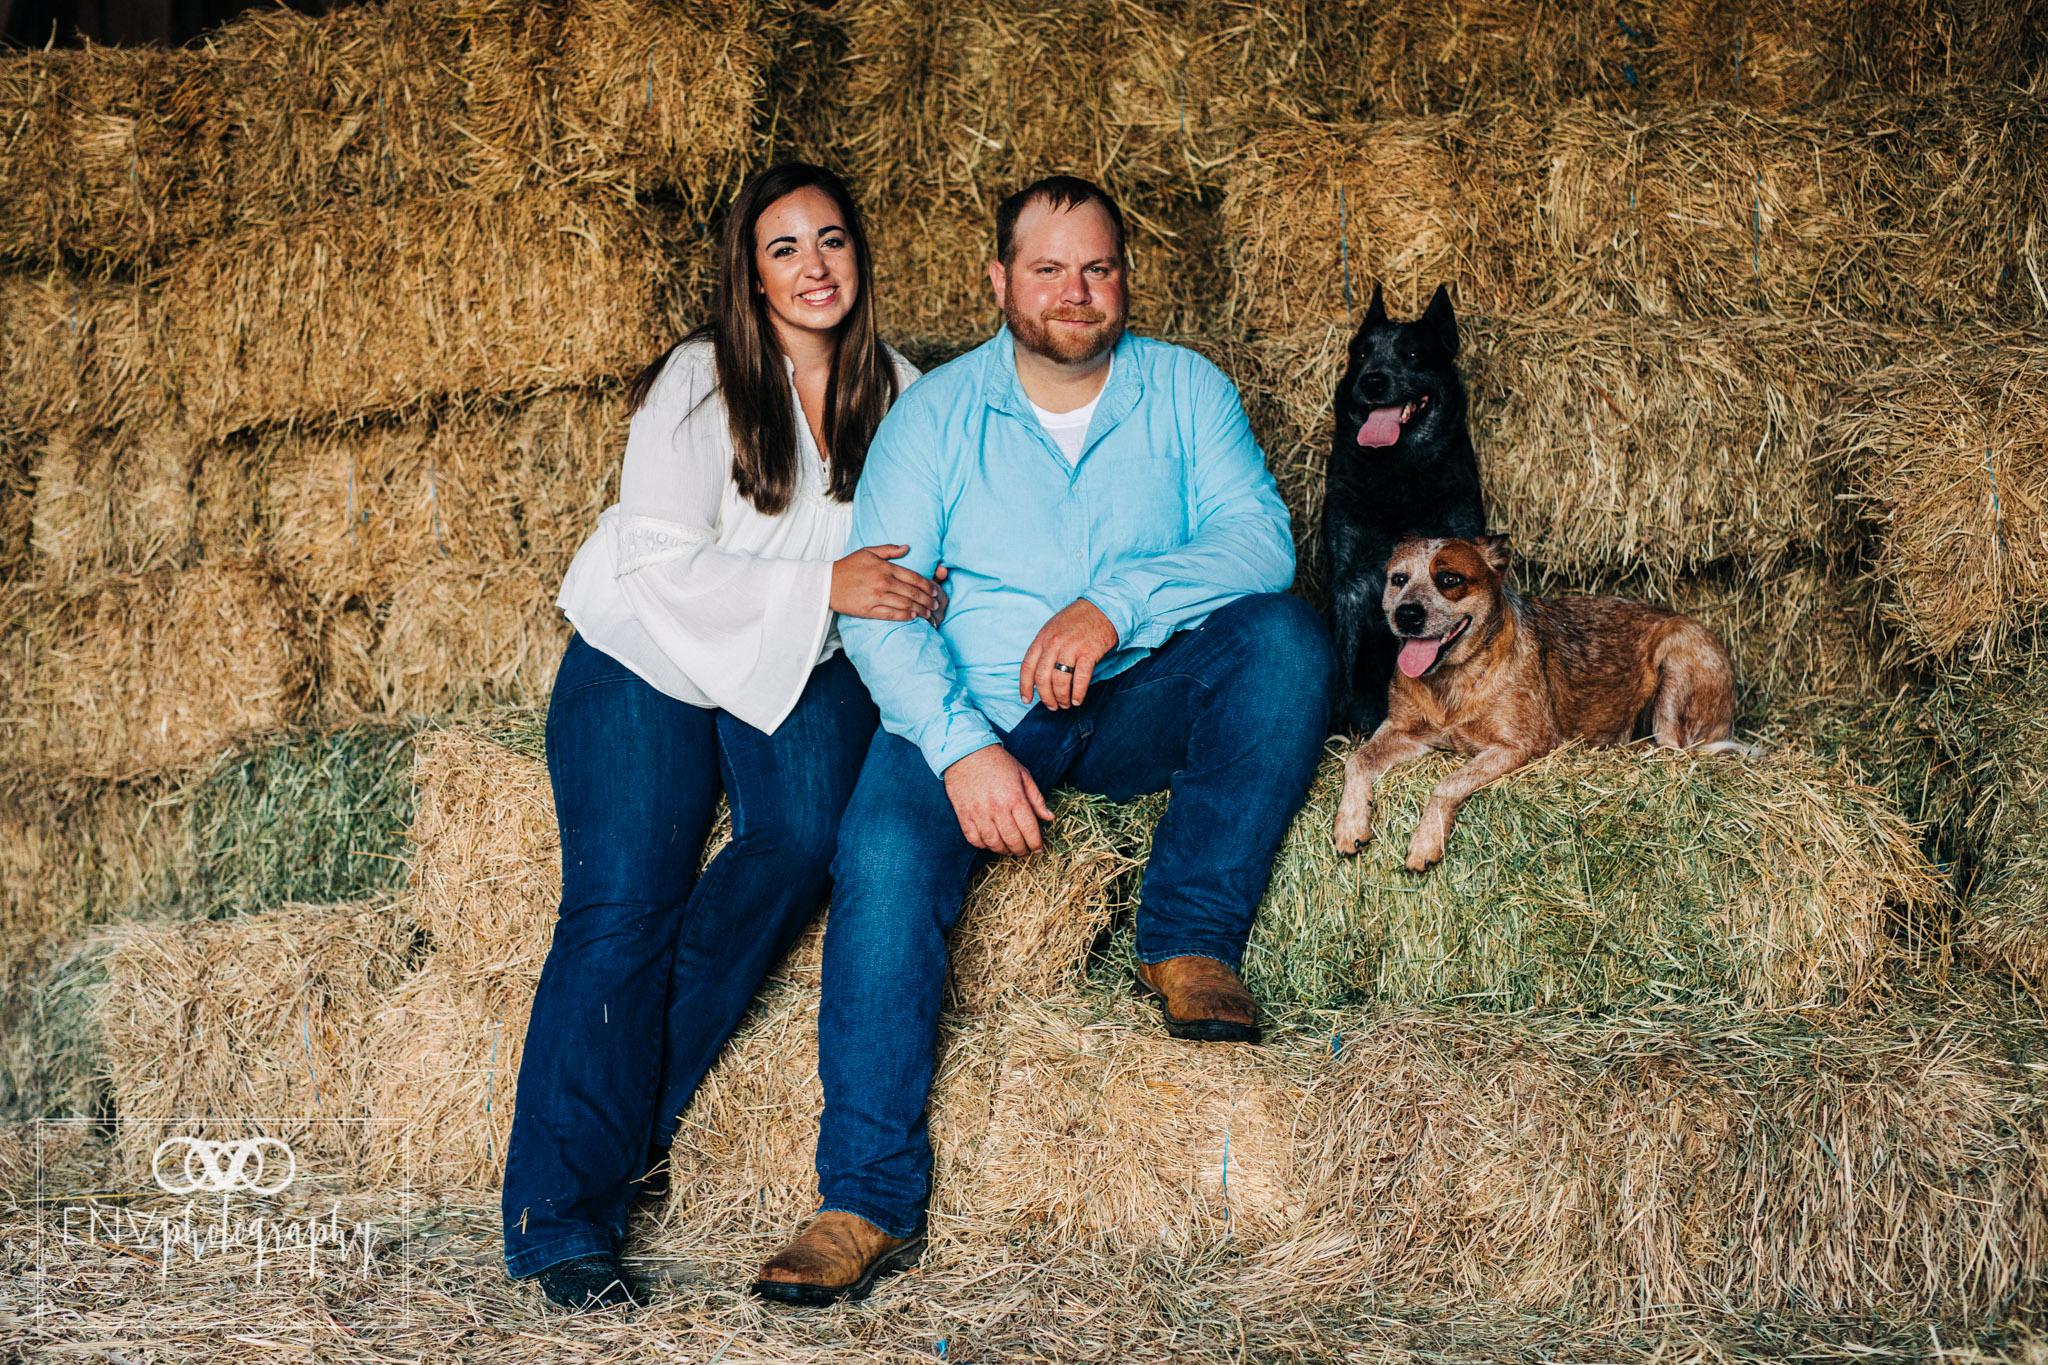 danville ohio farm family photography env photography mount vernon ohio (8).jpg